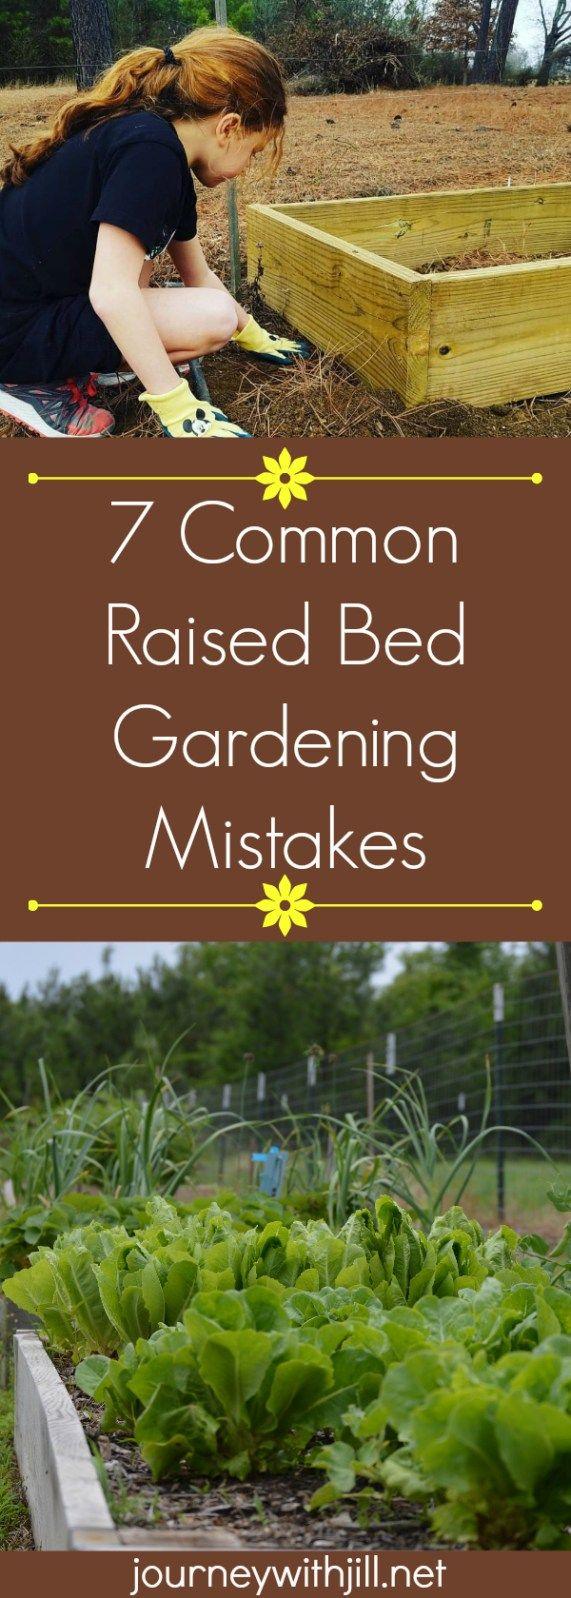 7 Common Mistakes in Raised Bed Gardening - The Beginner's Garden